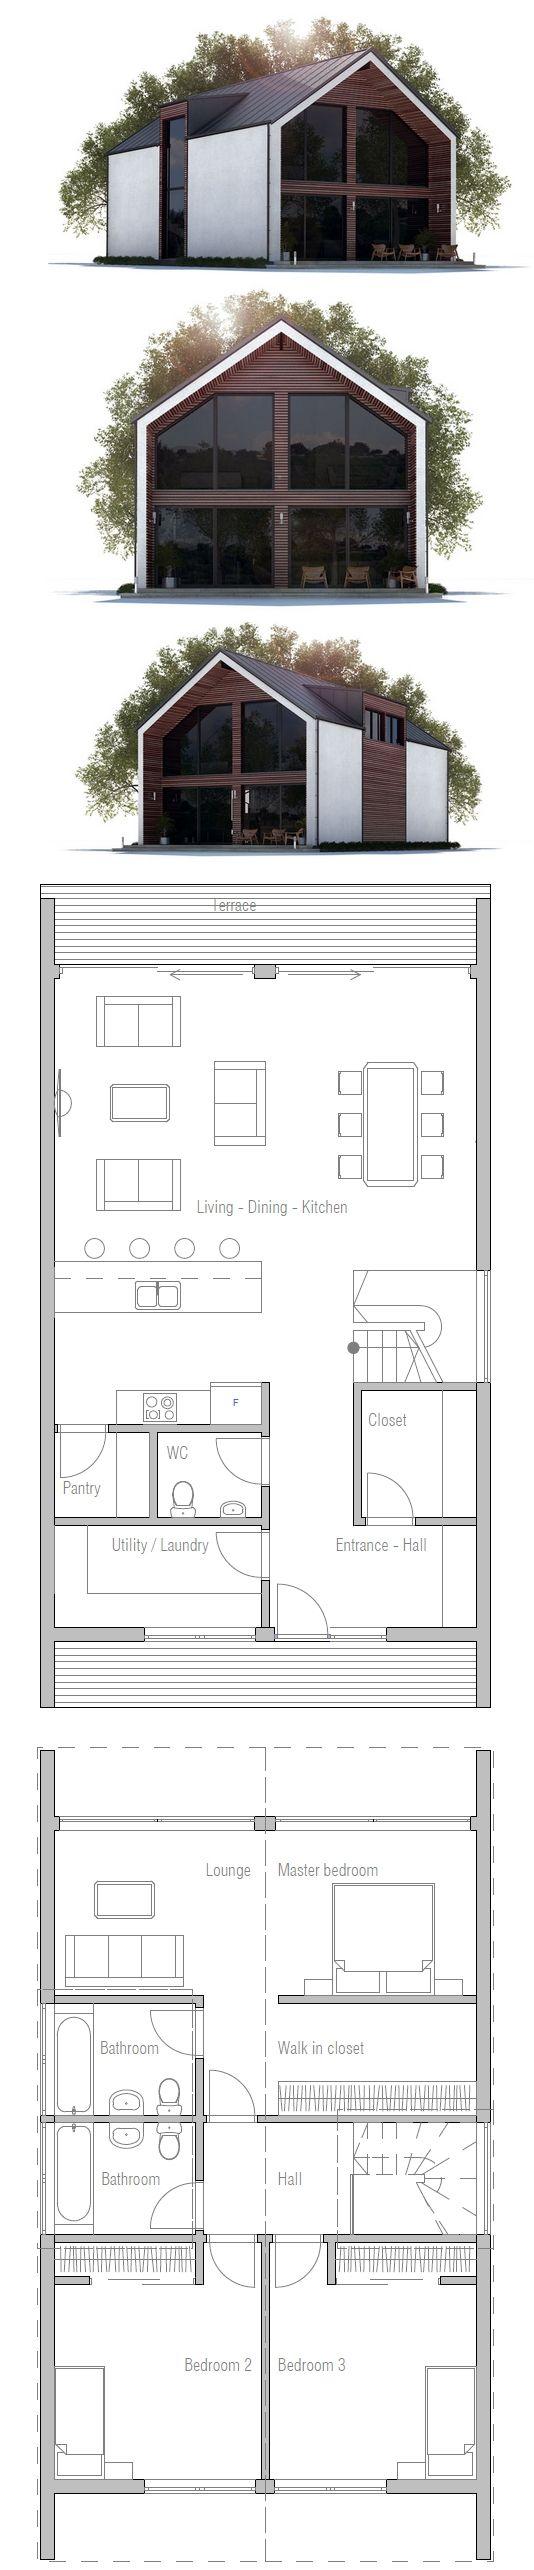 Pinterest Modern House Plans From Top Architects House Plans Modern House Plans Container House